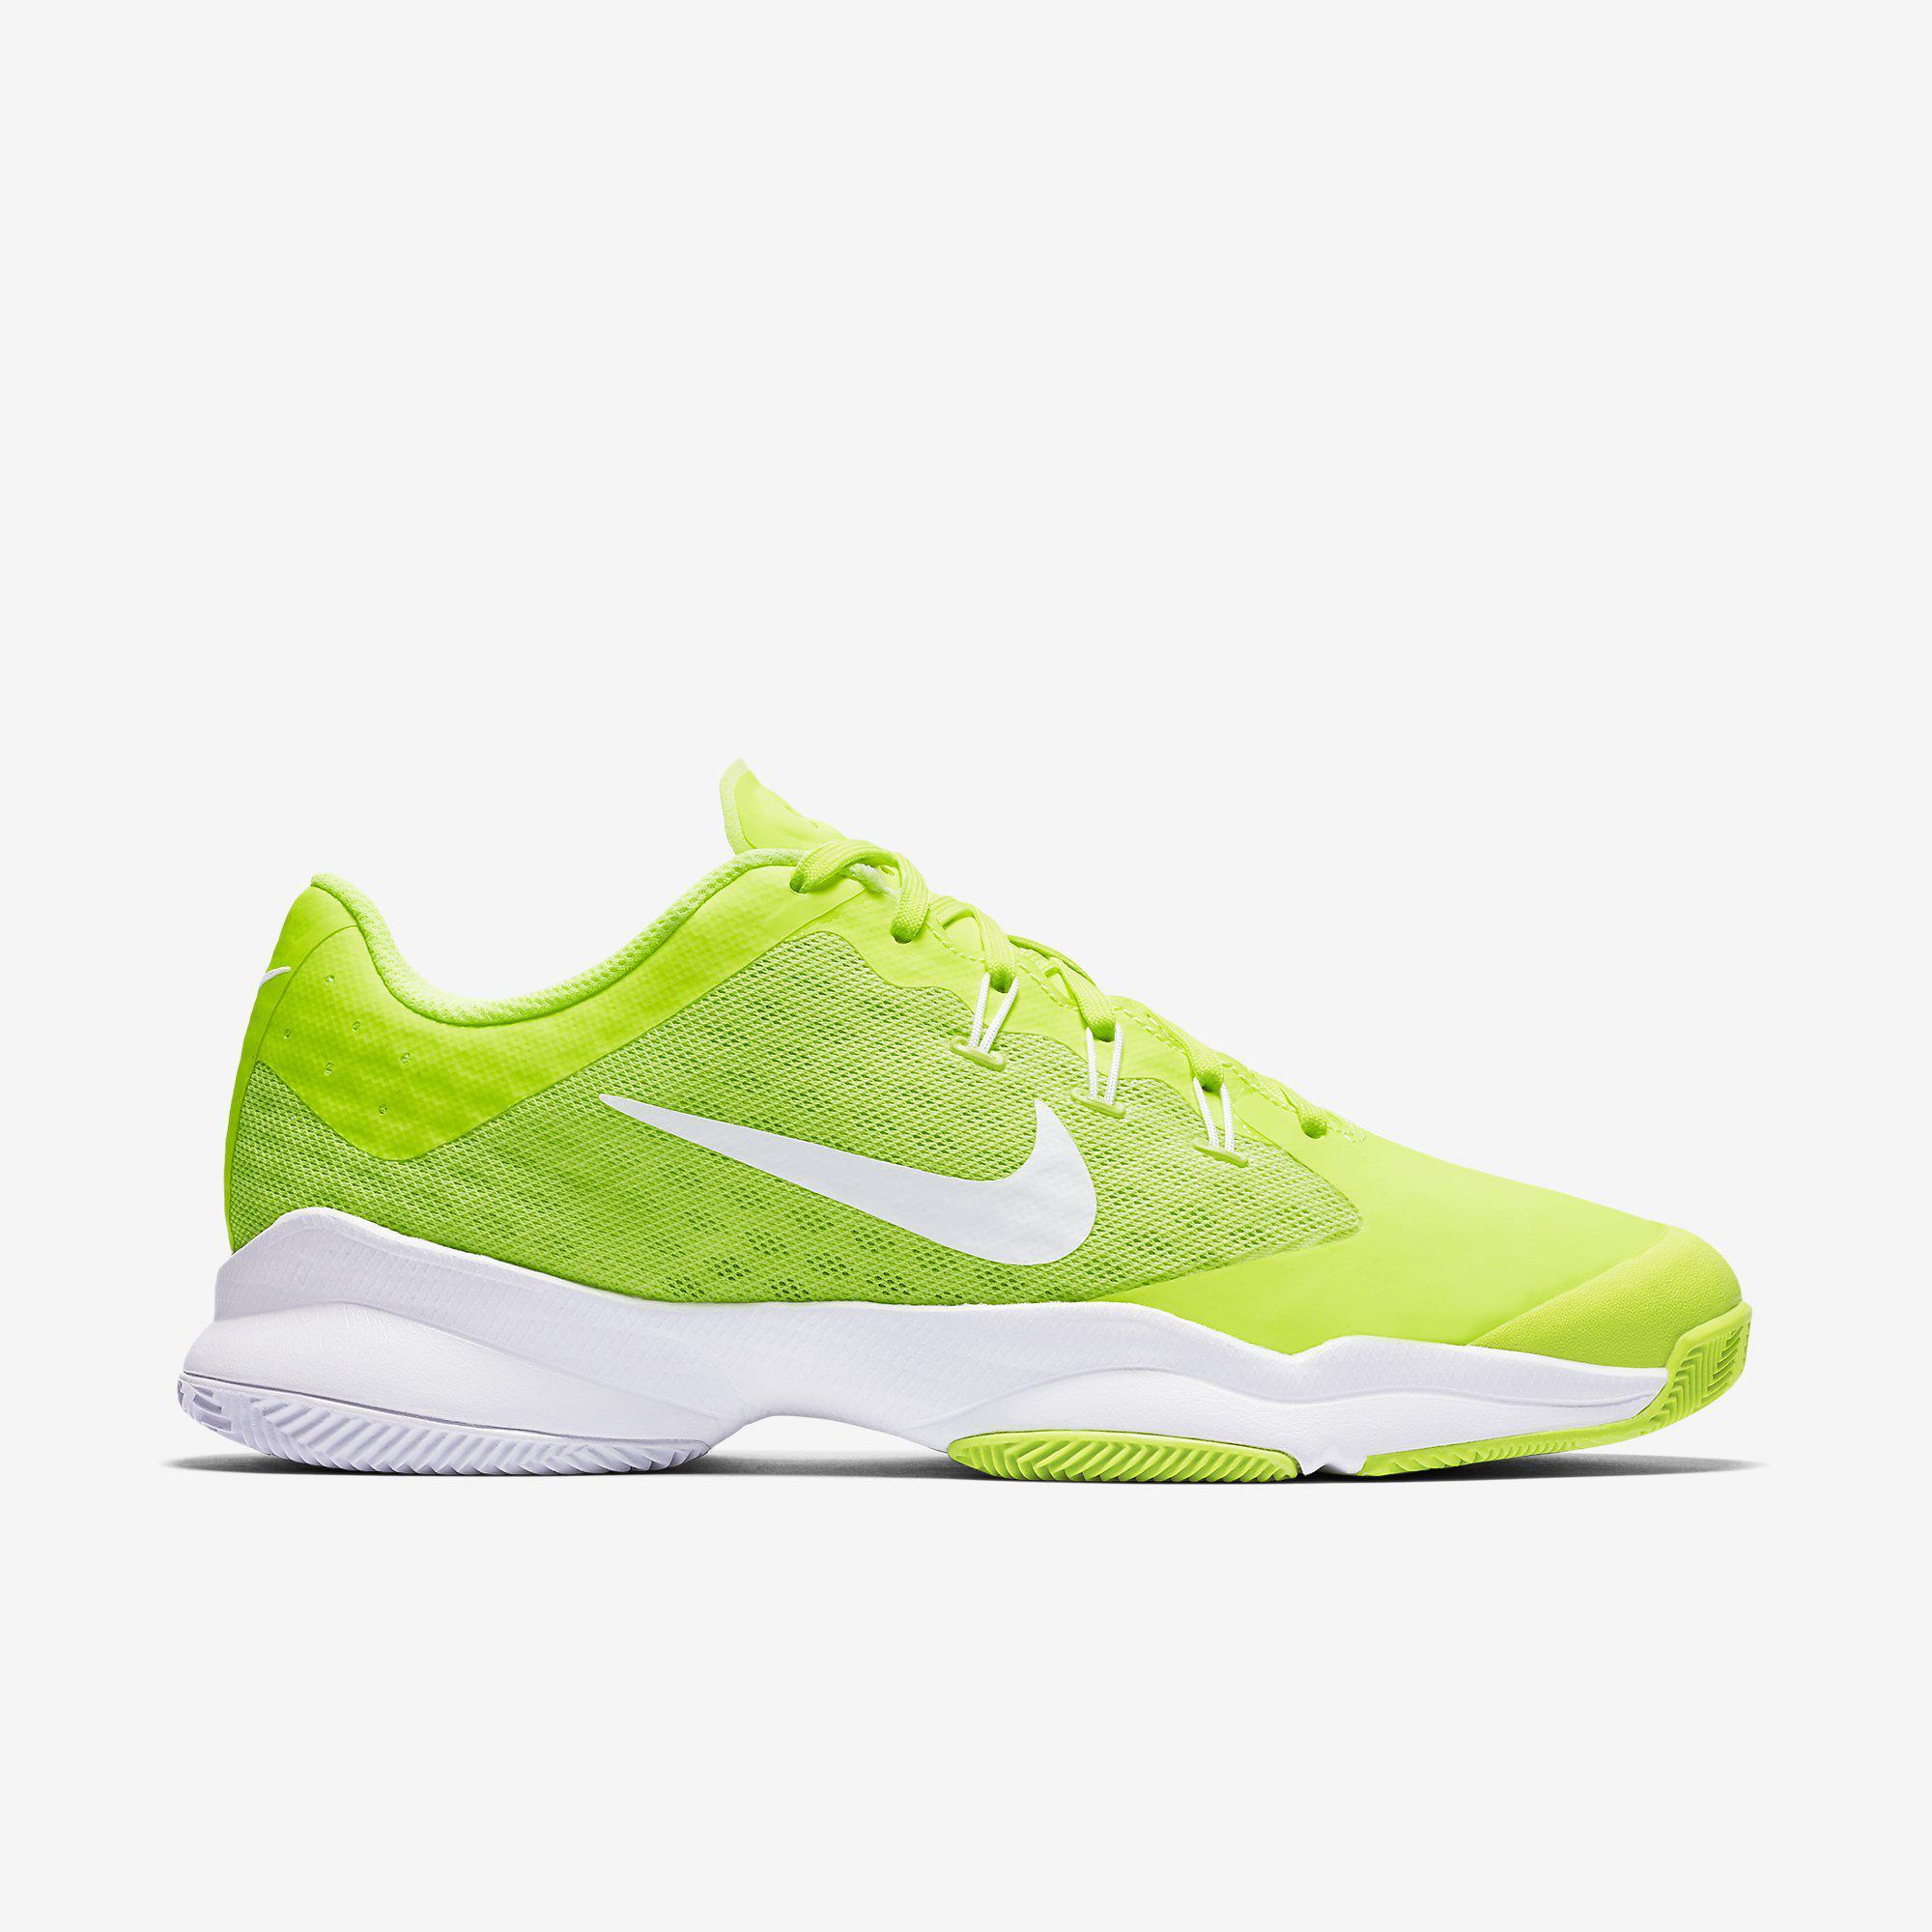 Nike Womens Air Zoom Ultra Tennis Shoes - Volt